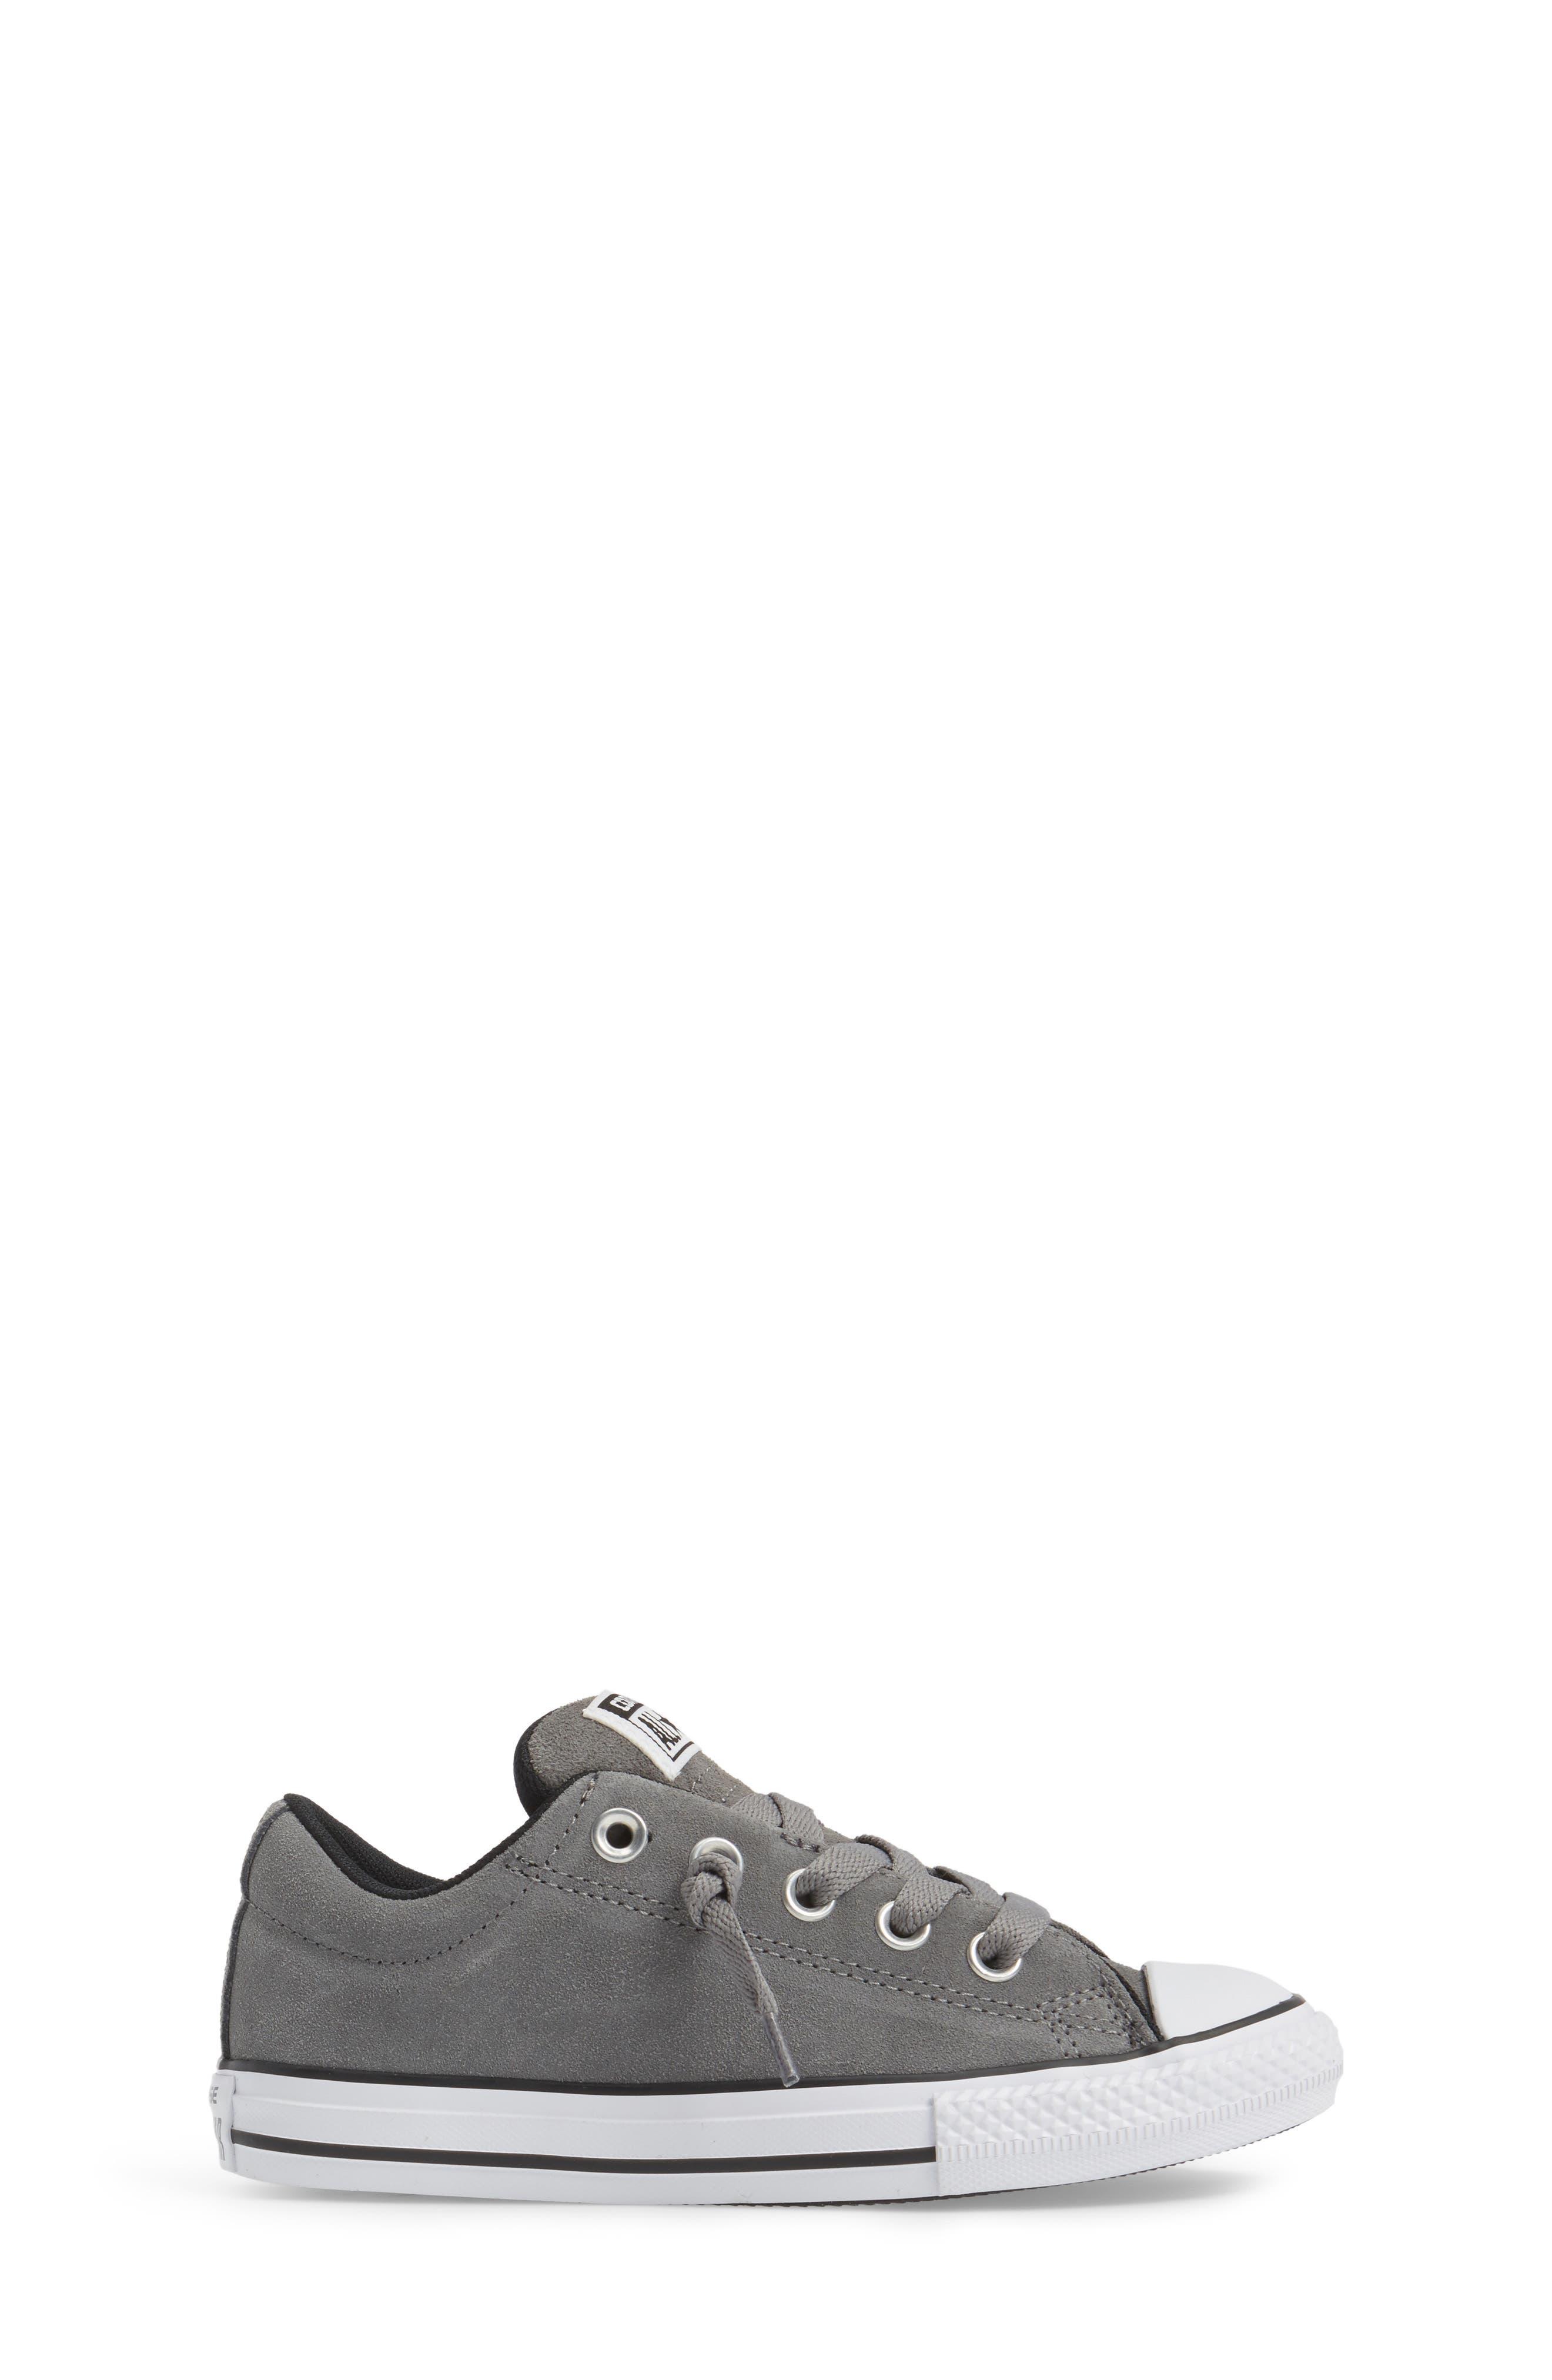 Chuck Taylor<sup>®</sup> All Star<sup>®</sup> Street Sneaker,                             Alternate thumbnail 3, color,                             Mason/ Black/ White